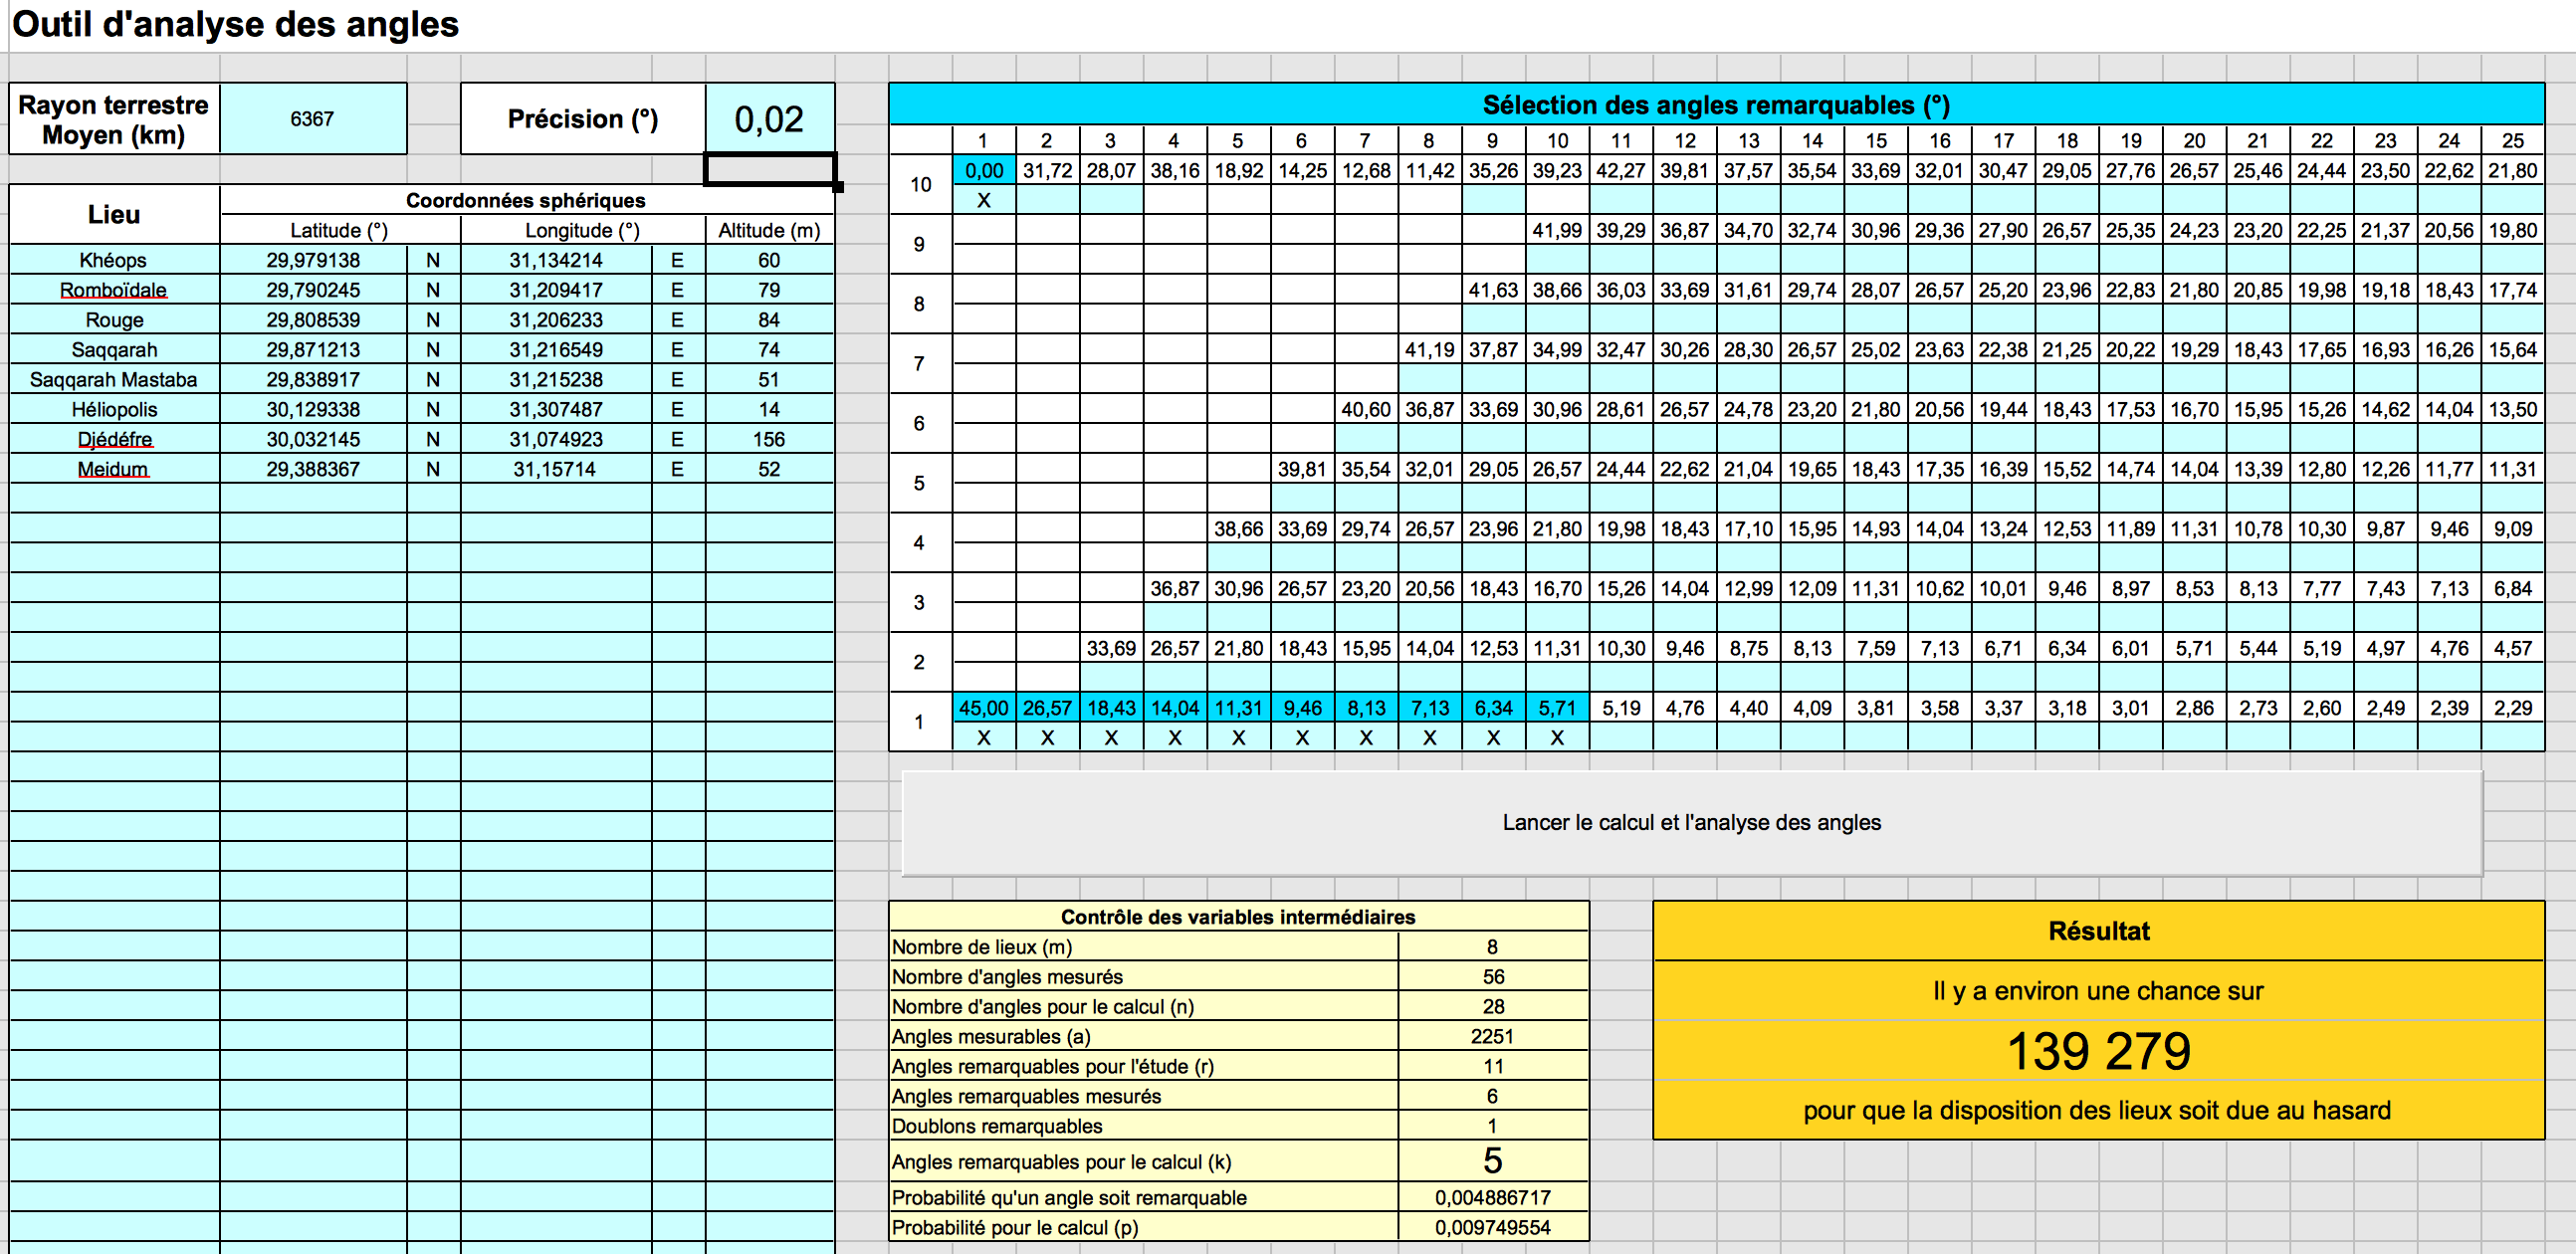 2017-11-16 09:11:22